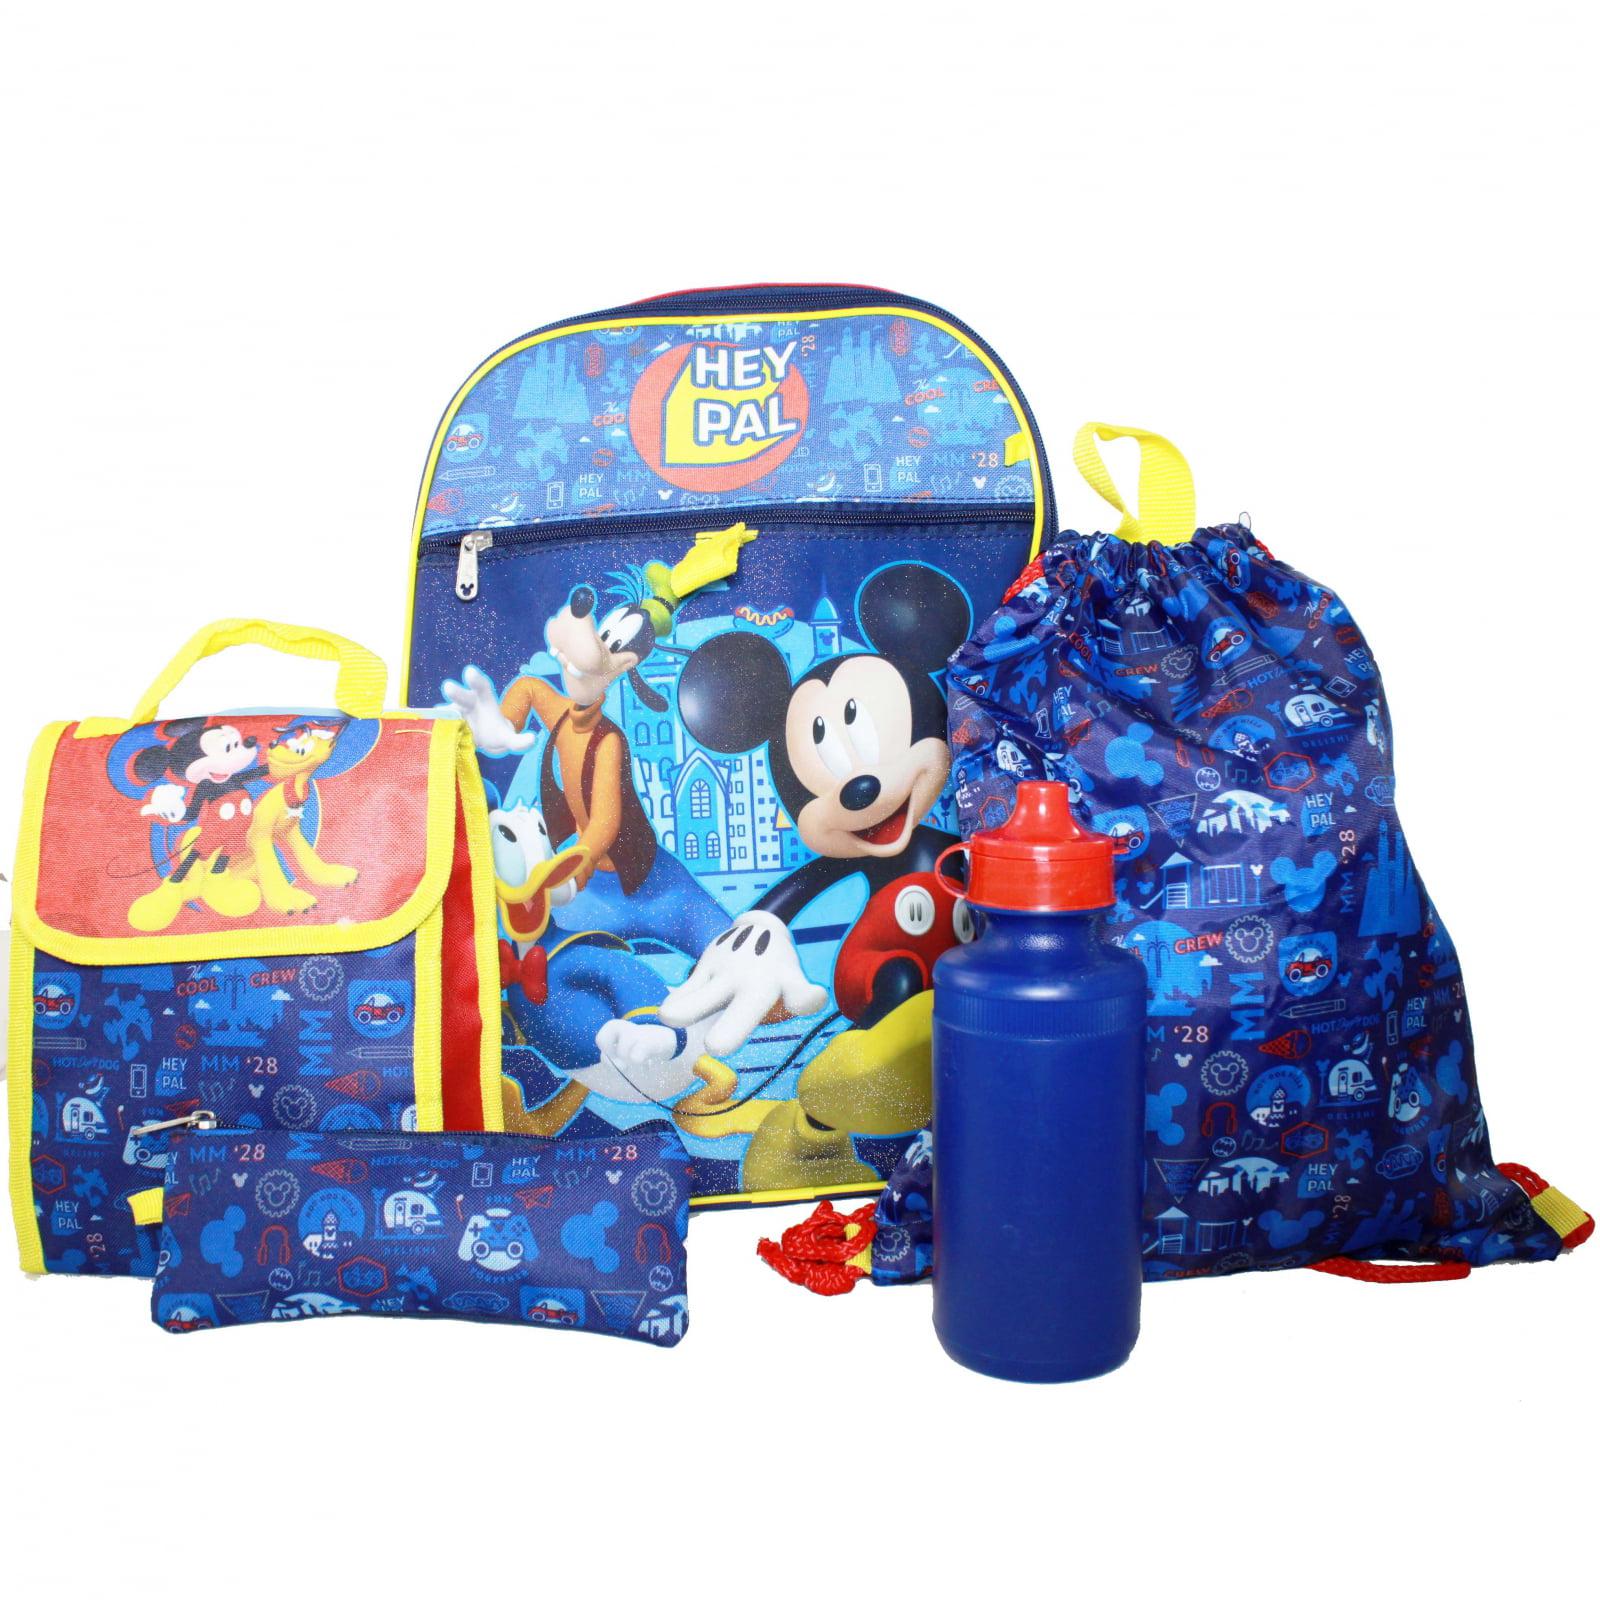 Disney Mickey Mouse Boys Backpack Set Lunch Bag Pencil Case Cinch Sack Bottle